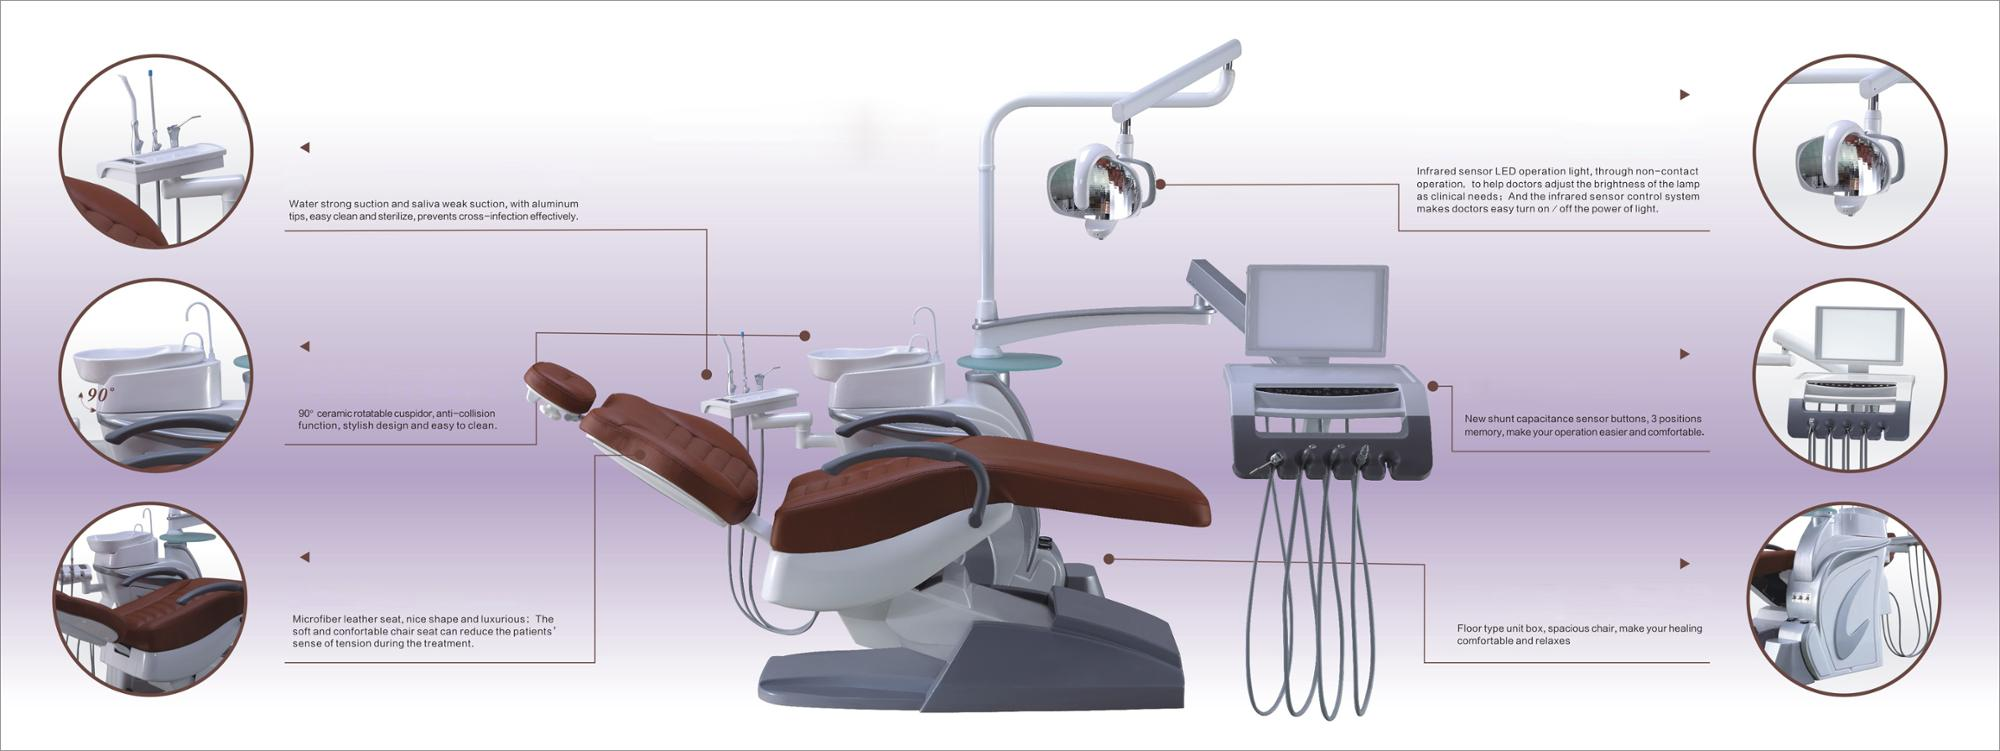 Electric Advanced Dental Chair